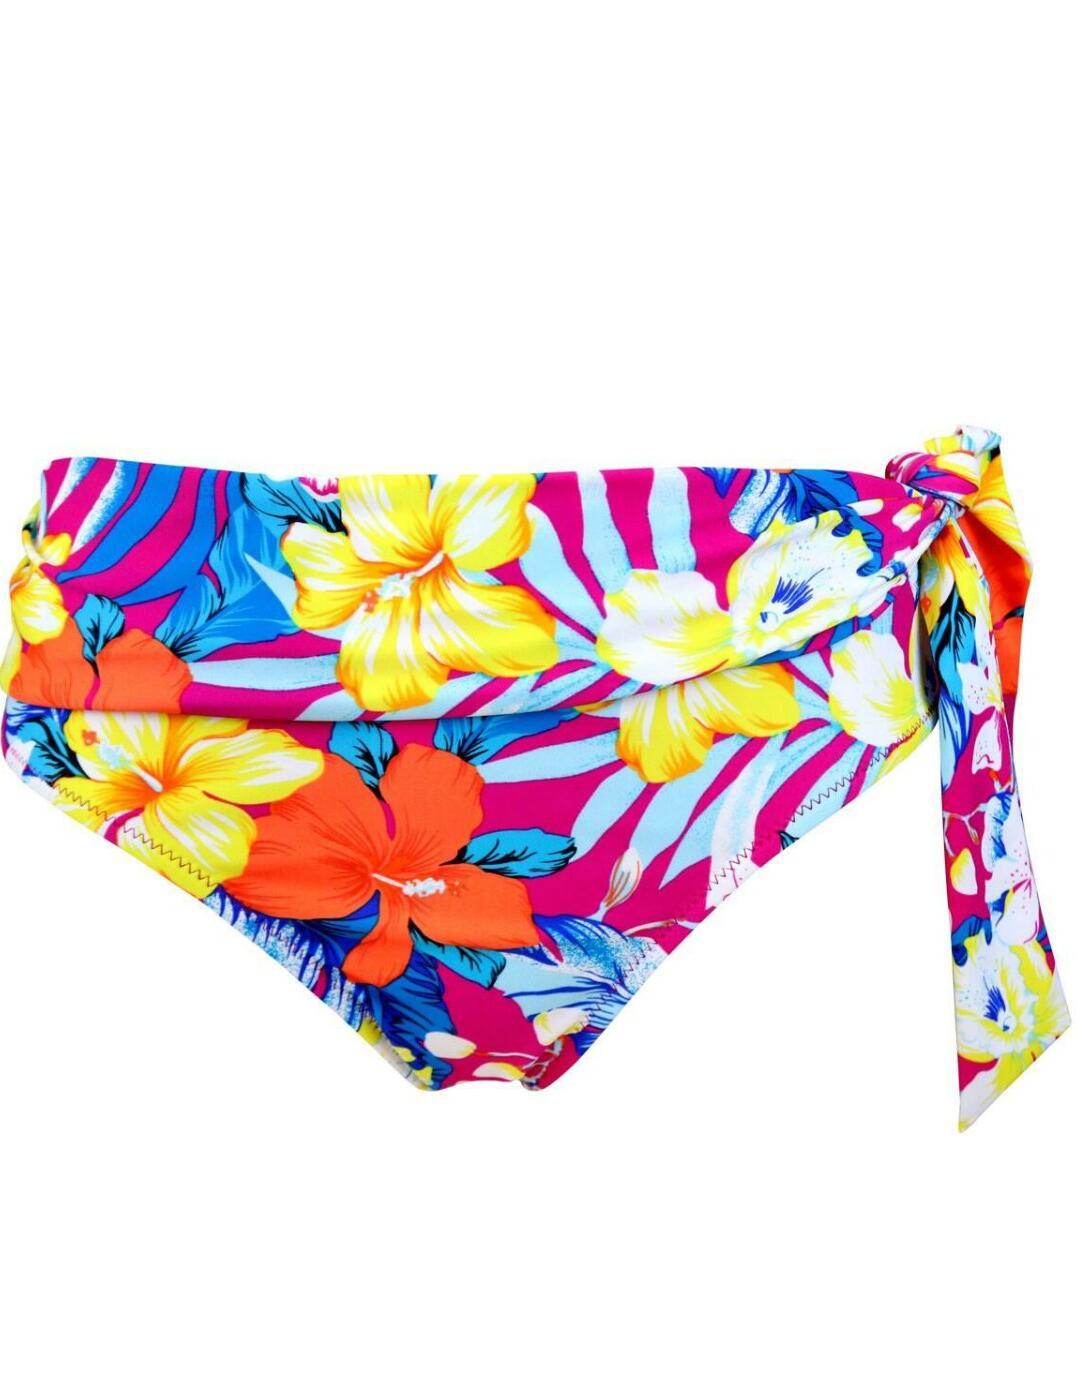 Pour-Moi-Heatwave-Fold-Over-Bikini-Brief-Bottoms-86003-New-Womens-Swimwear thumbnail 3